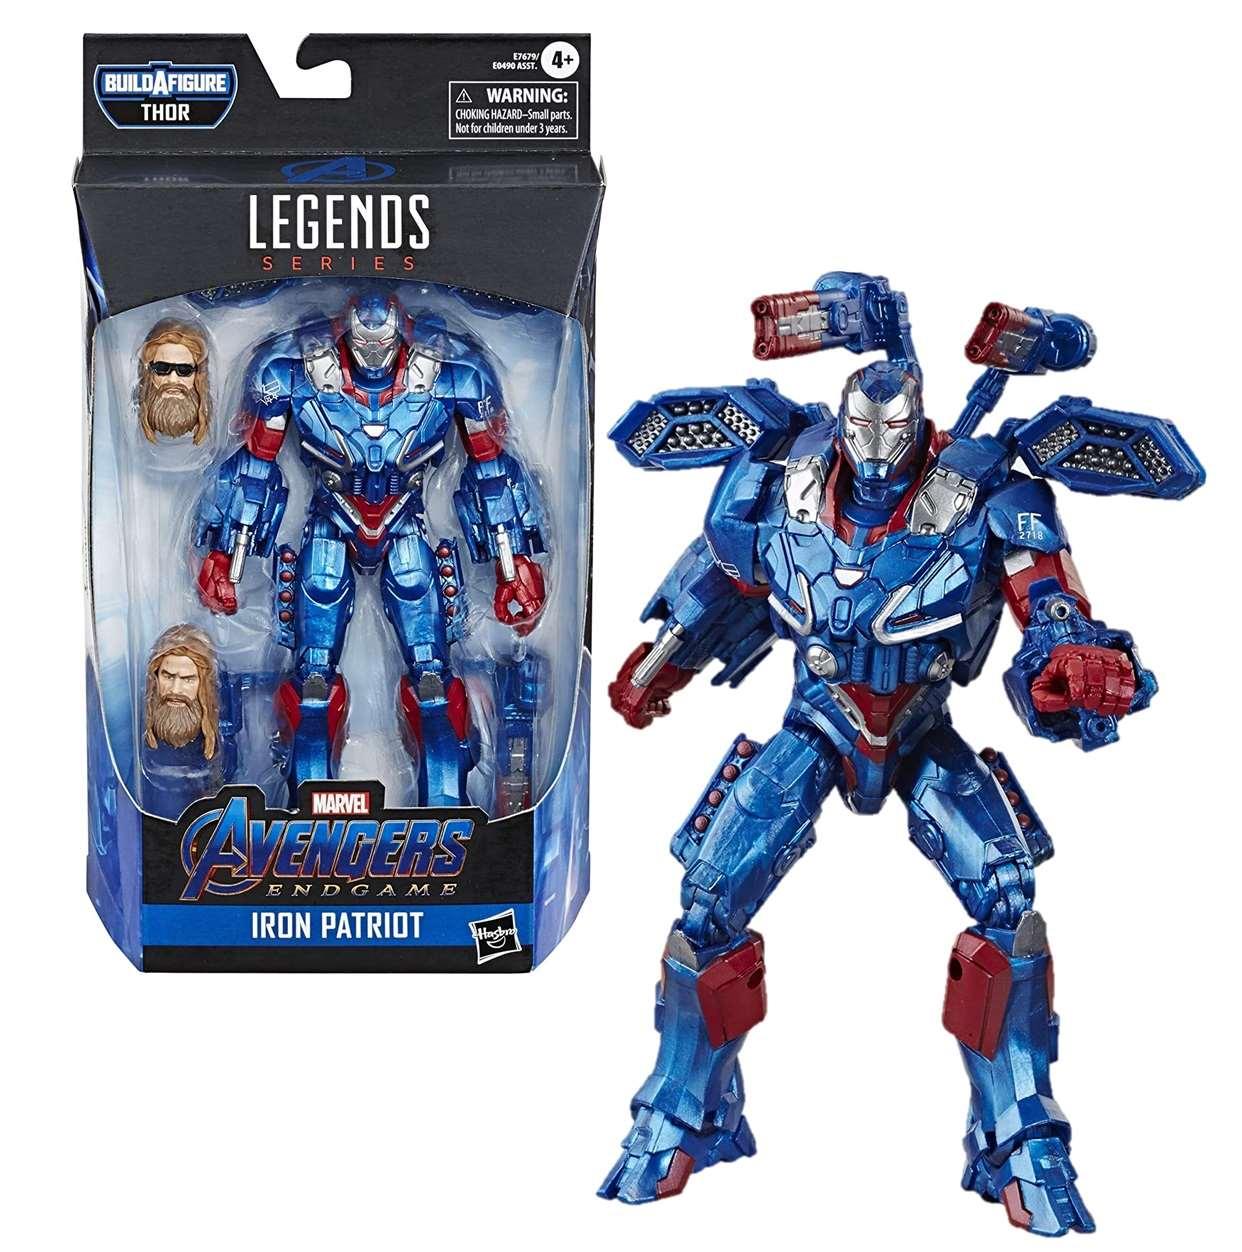 Iron Patriot Figura B A F Thor Avengers End Game Legends